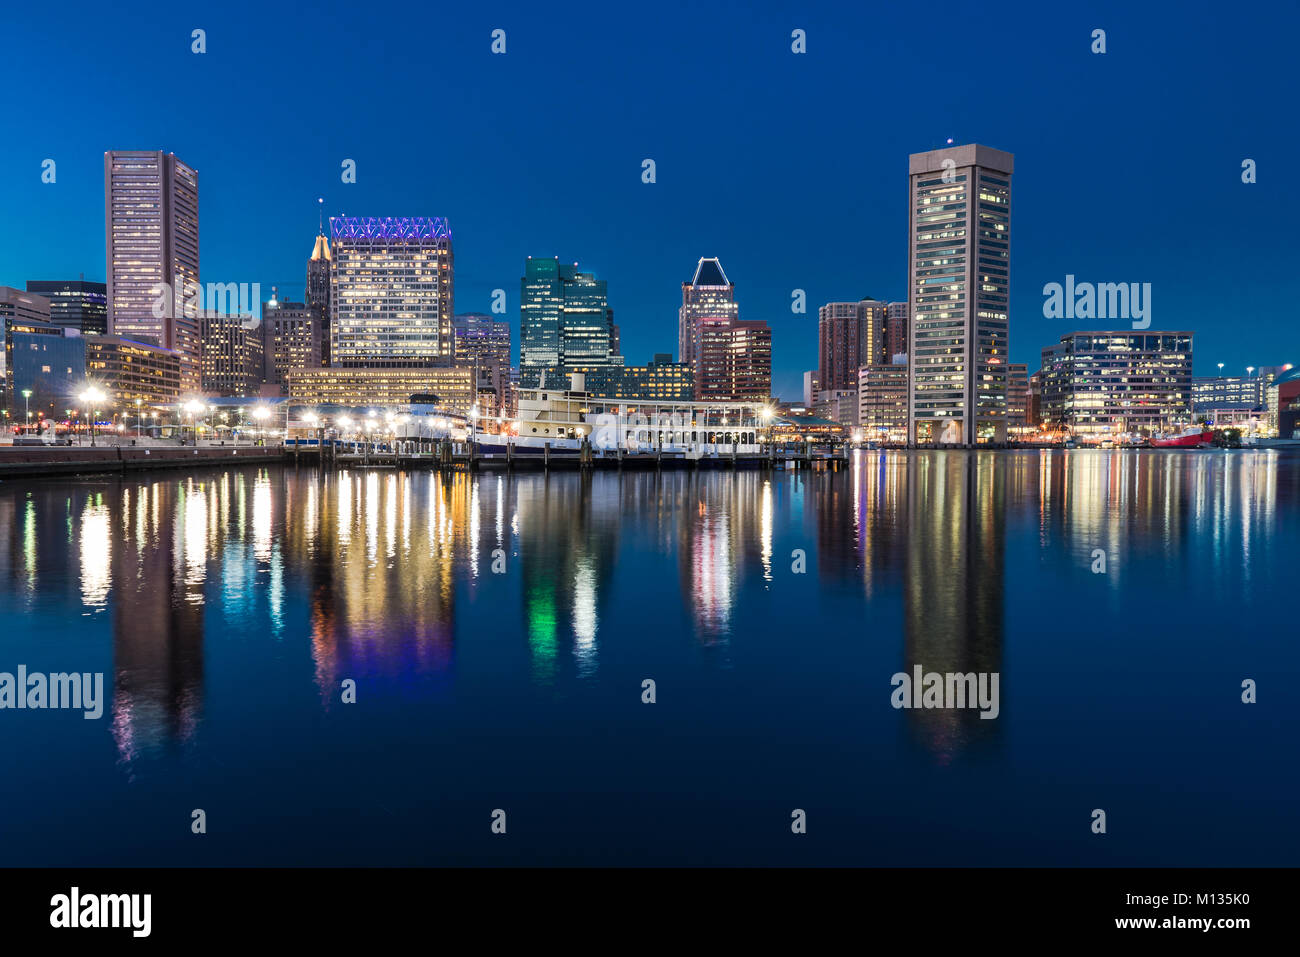 BALTIMORE, MD - DECEMBER 29, 2014: Baltimore night skyline reflection from Inner Harbor Stock Photo